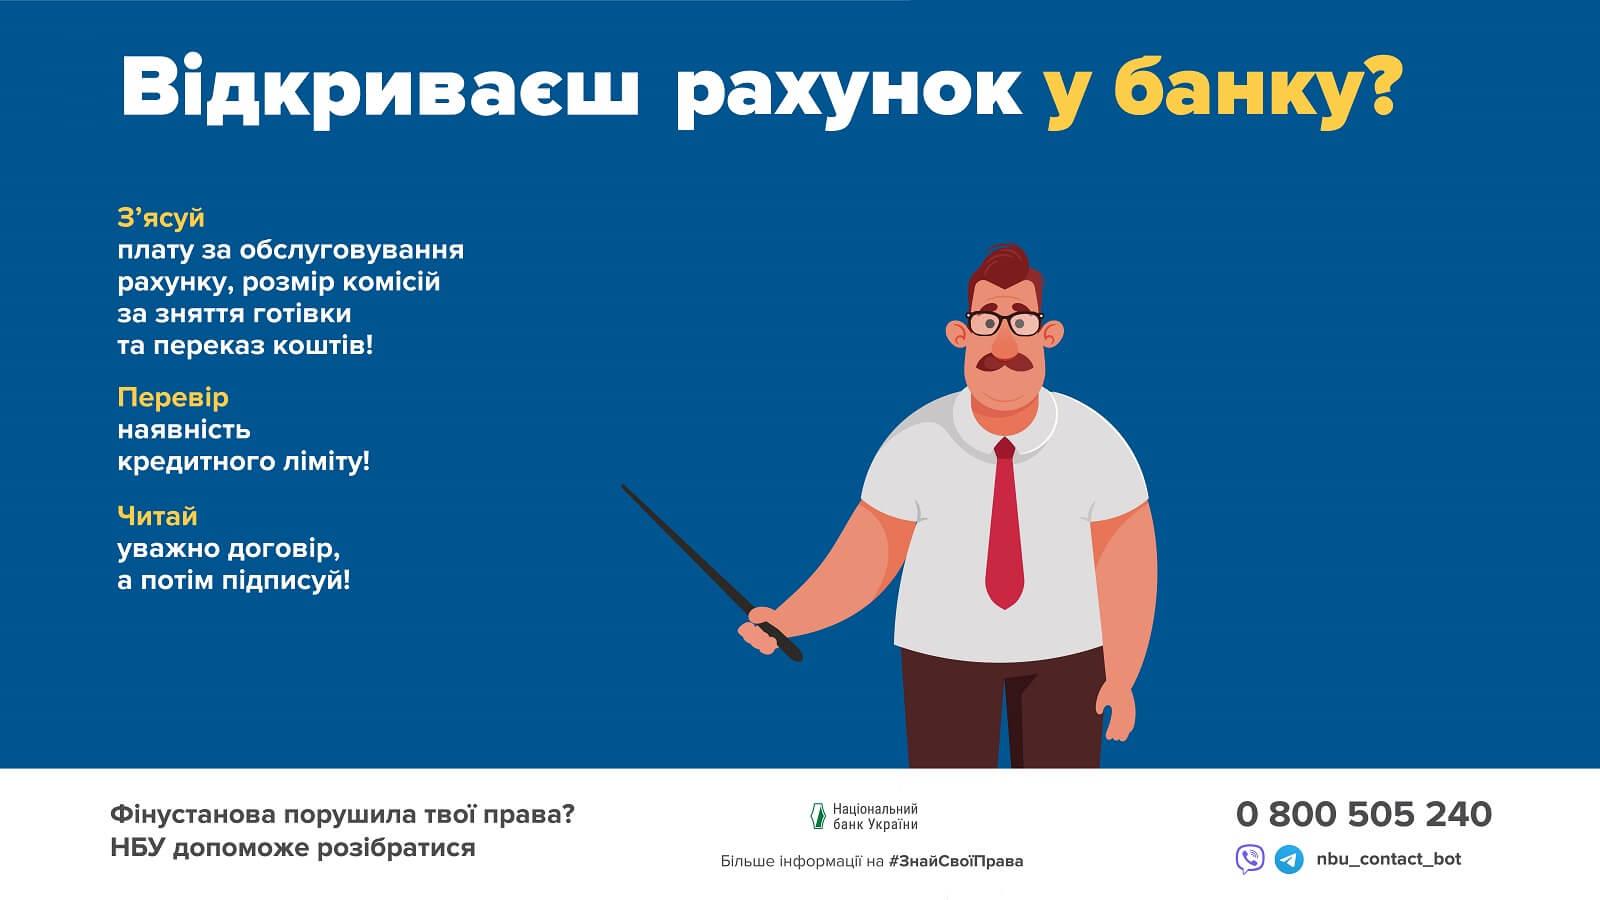 Открываешь счет в банке? - фото - mtb.ua